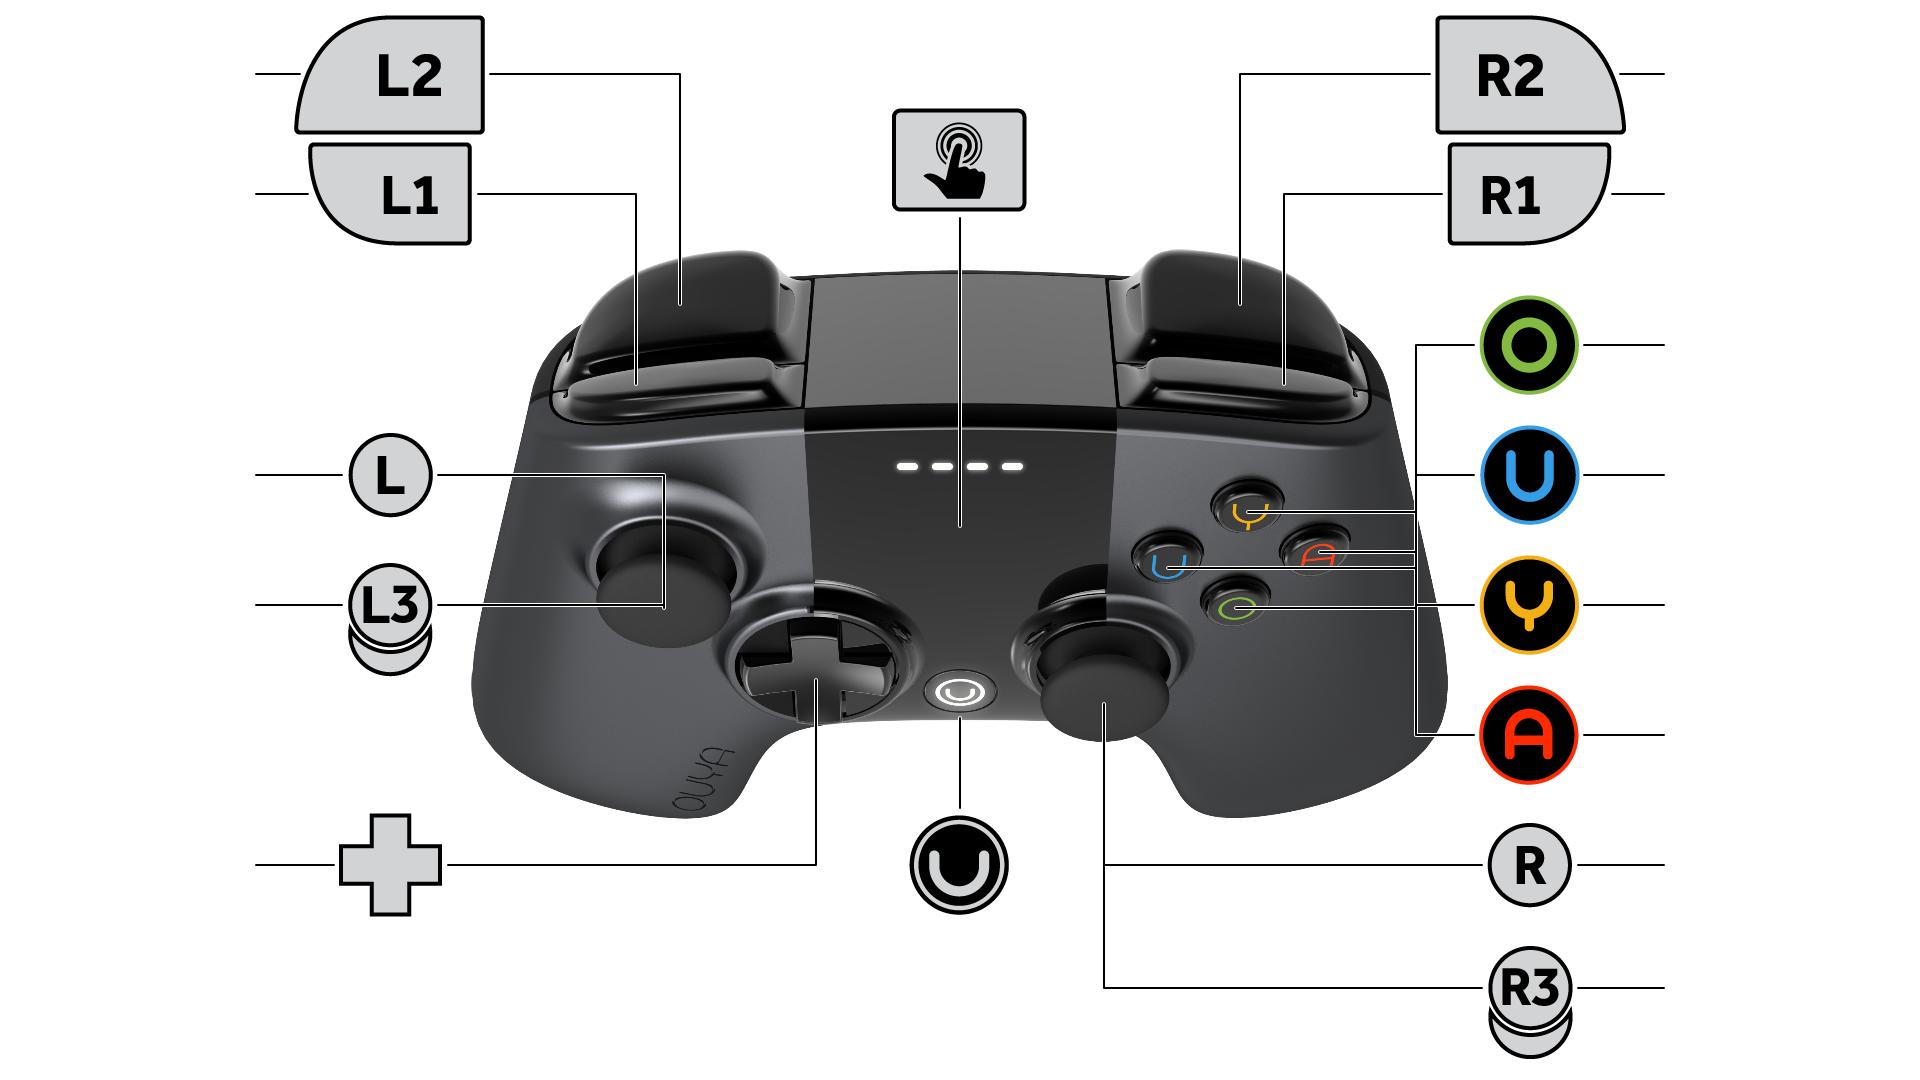 ouya gamepad controller layout diagram white bg by qubodup on deviantart rh qubodup deviantart com playstation 4 controller diagram playstation 2 controller diagram